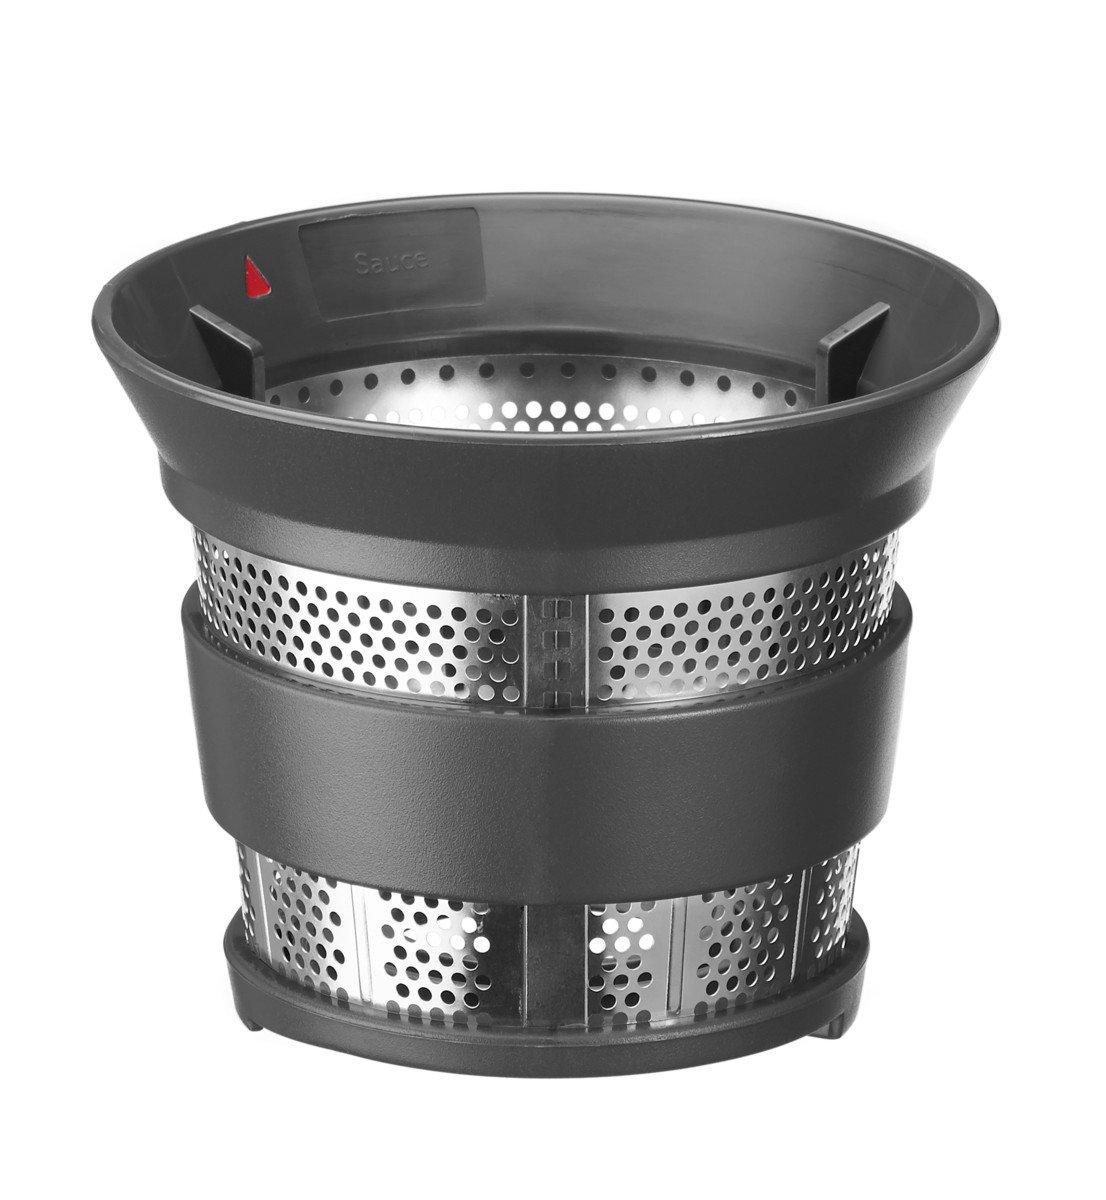 KitchenAid 5KSM1JA - Exprimidor (Exprimidor lenta, Plata, 1 L, De plástico, Acero inoxidable, Titanio): Amazon.es: Hogar